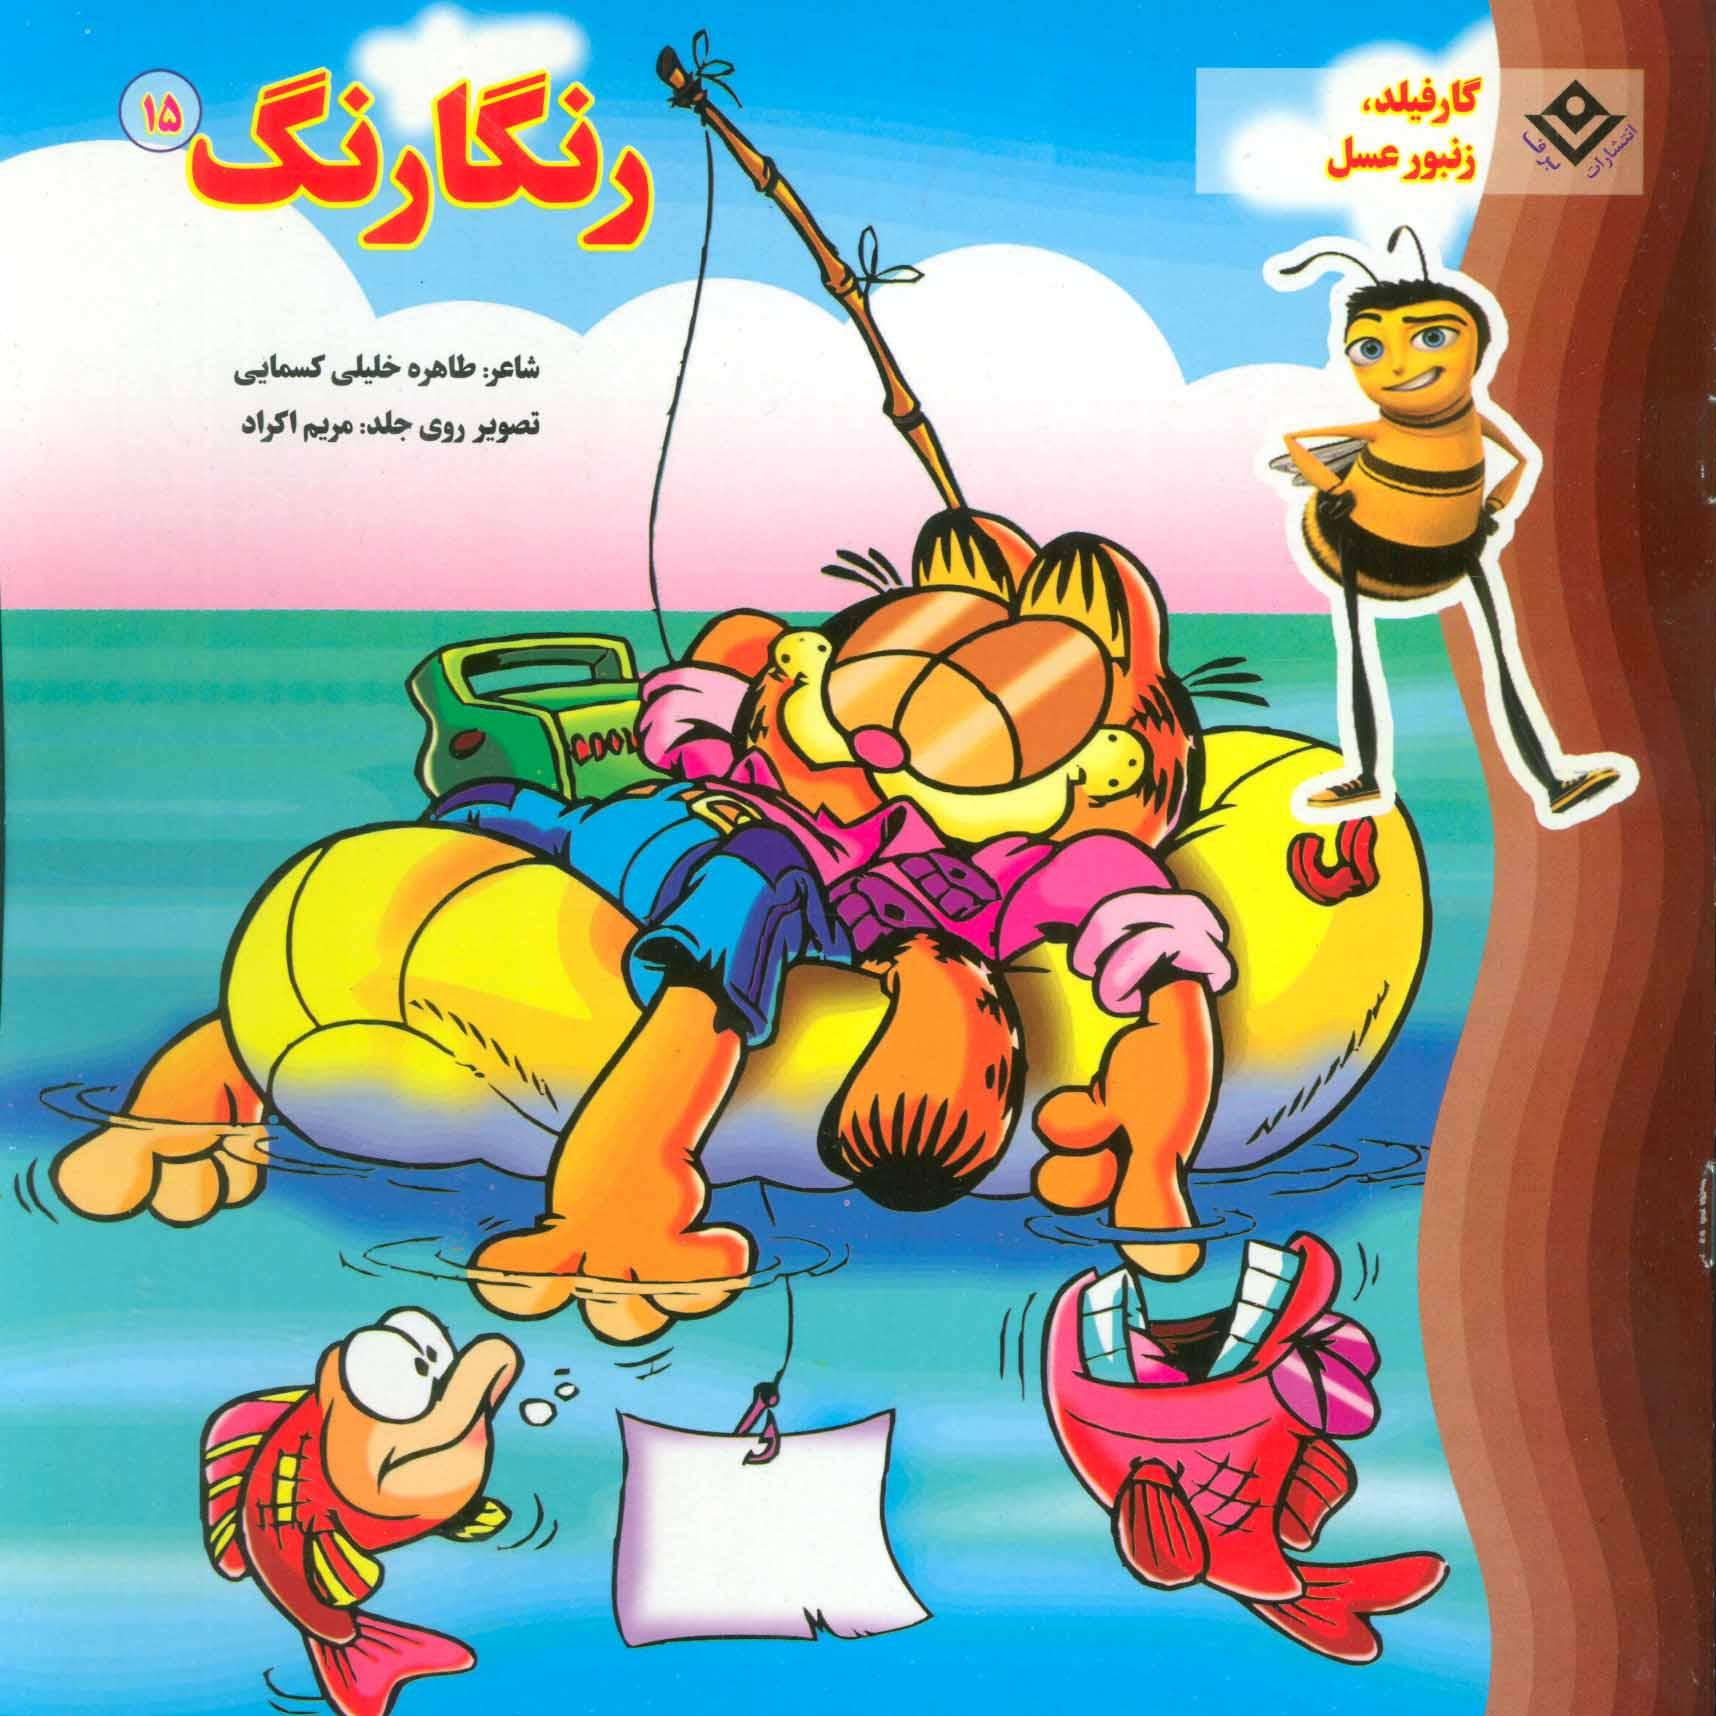 کتاب رنگارنگ